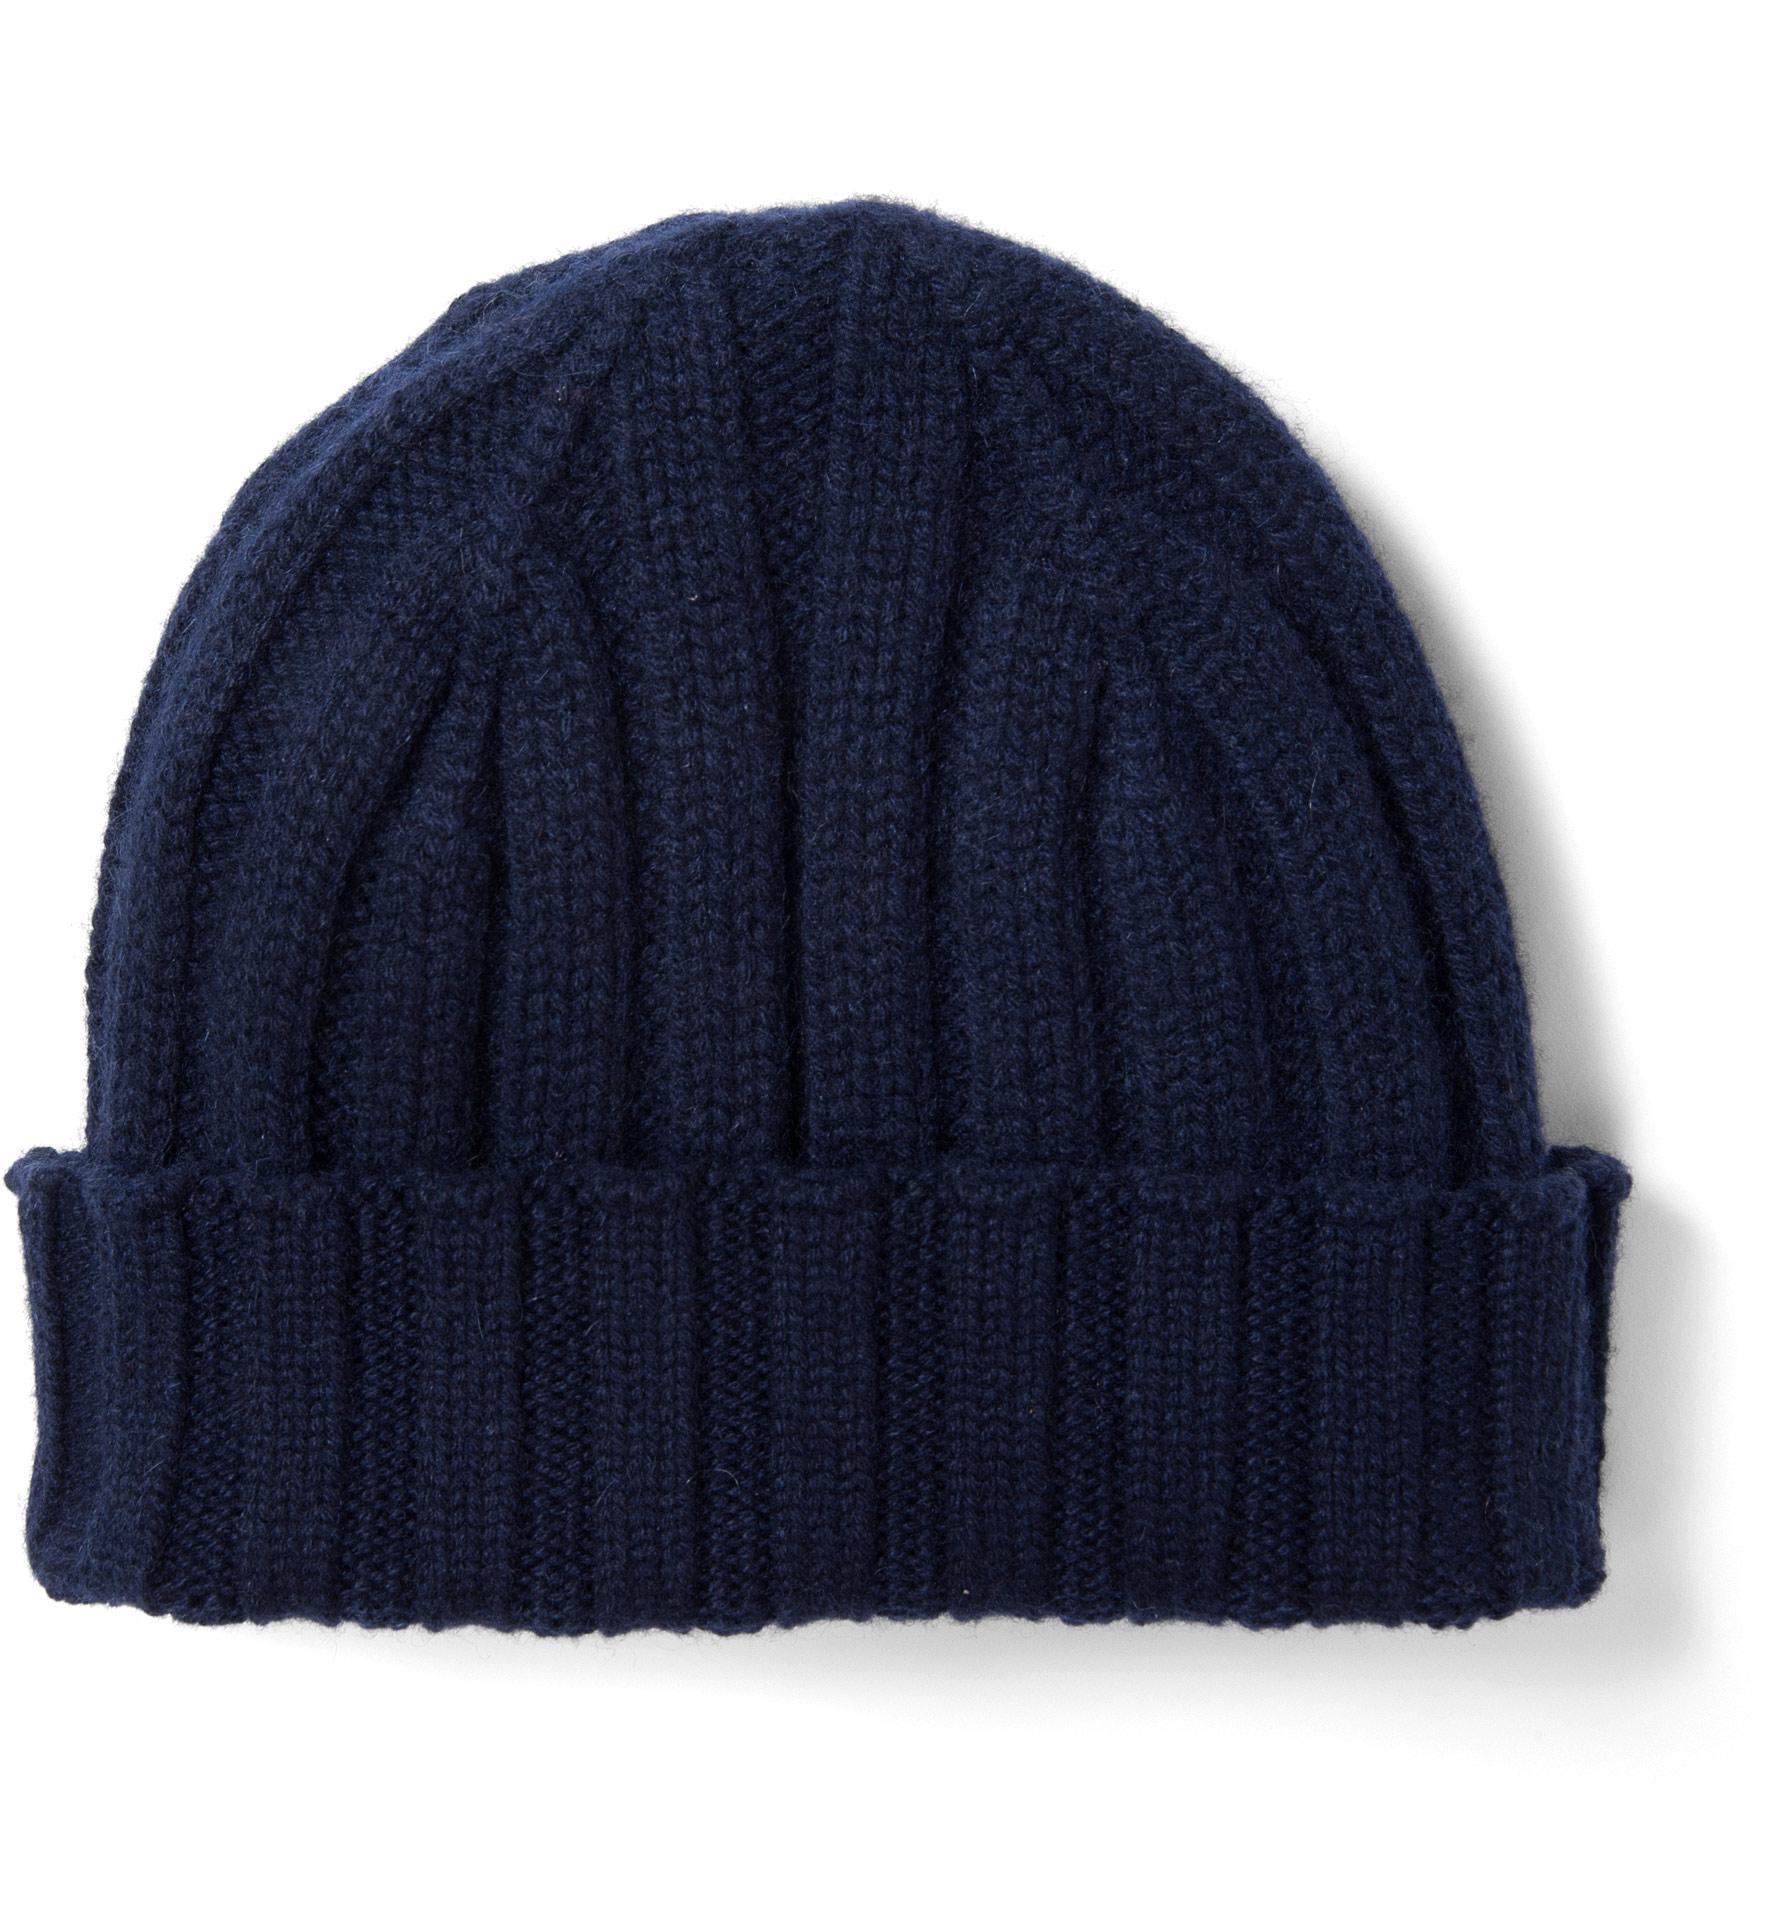 Knitting Pattern Cashmere Hat : Navy Cashmere Knit Hat by Proper Cloth